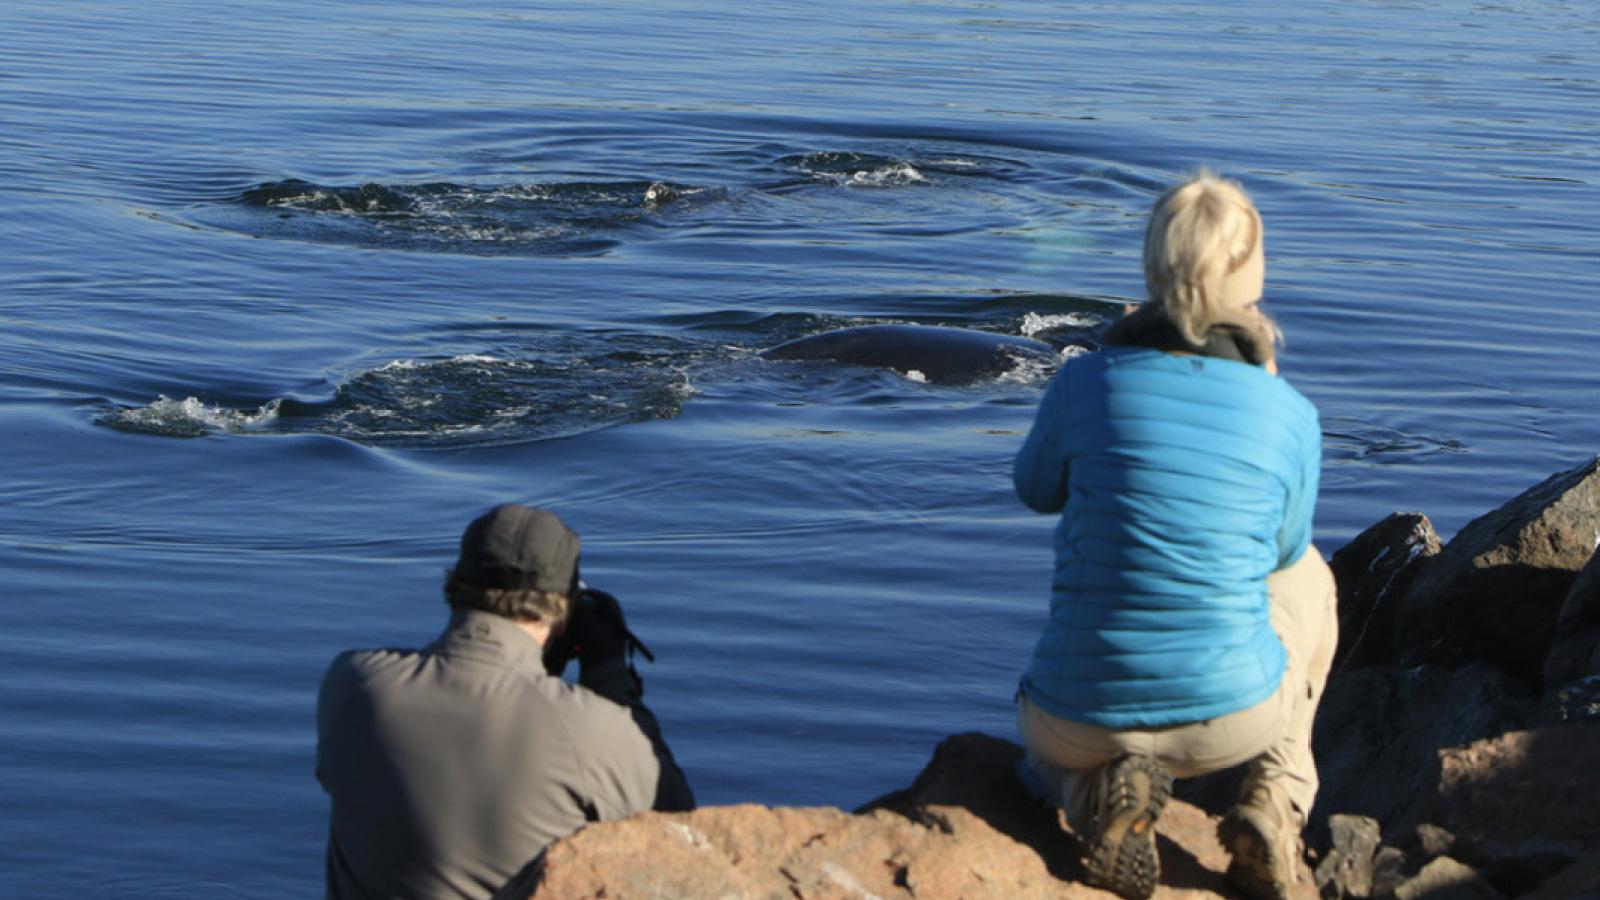 Wale beobachten in Nova Scotia / Kanada